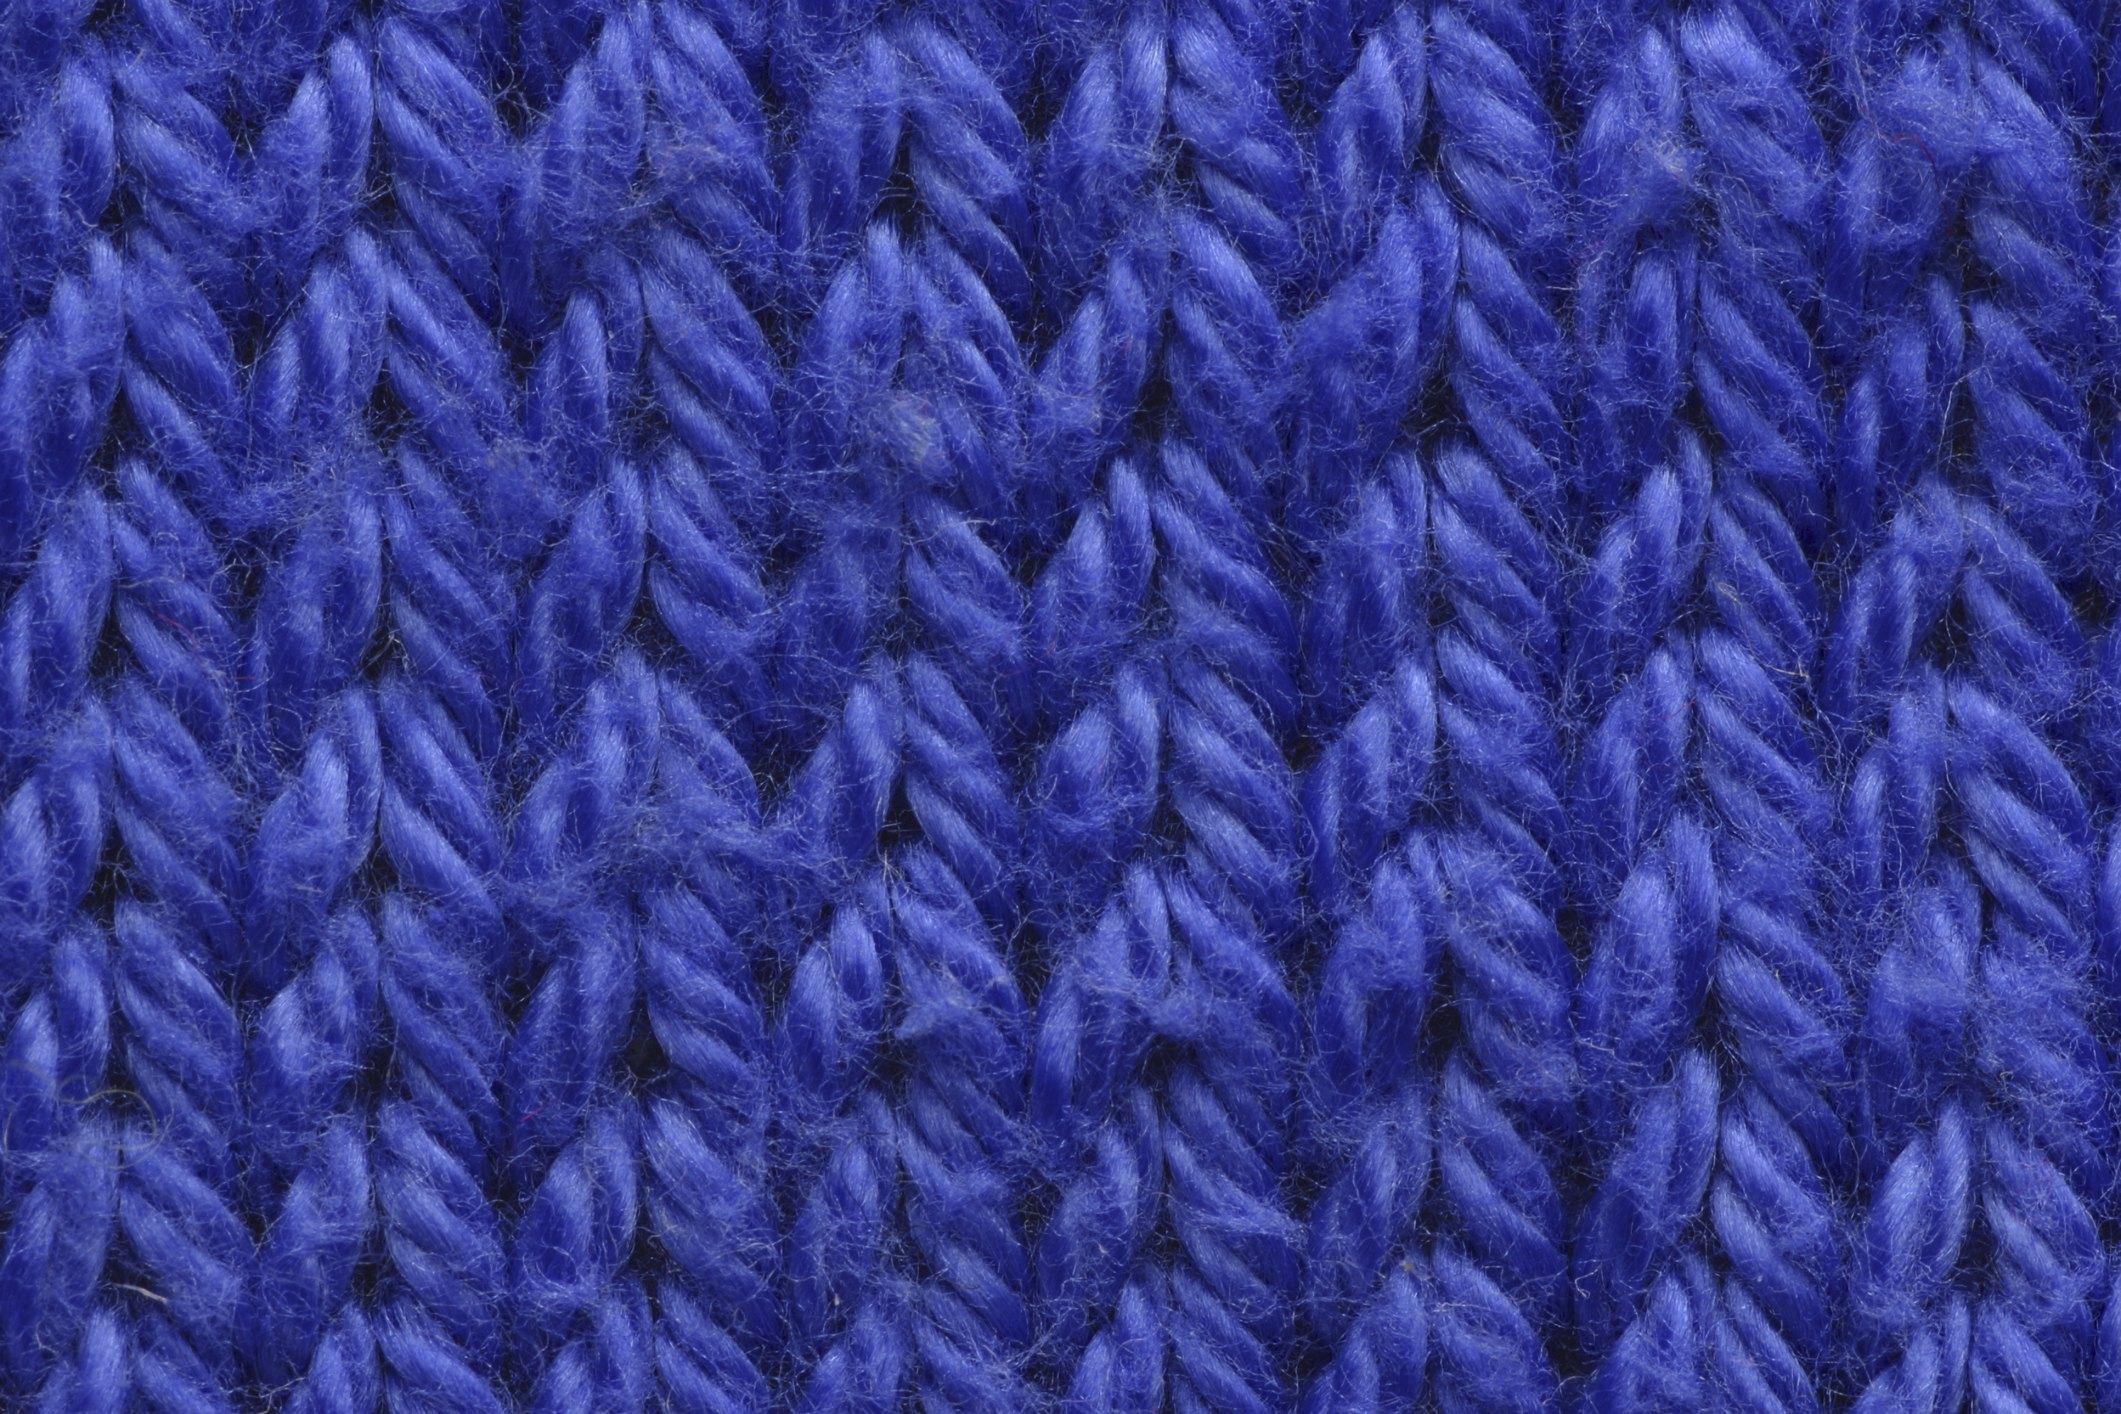 Knitting Fabric Dyeing Process : How to dye knit fabrics ehow